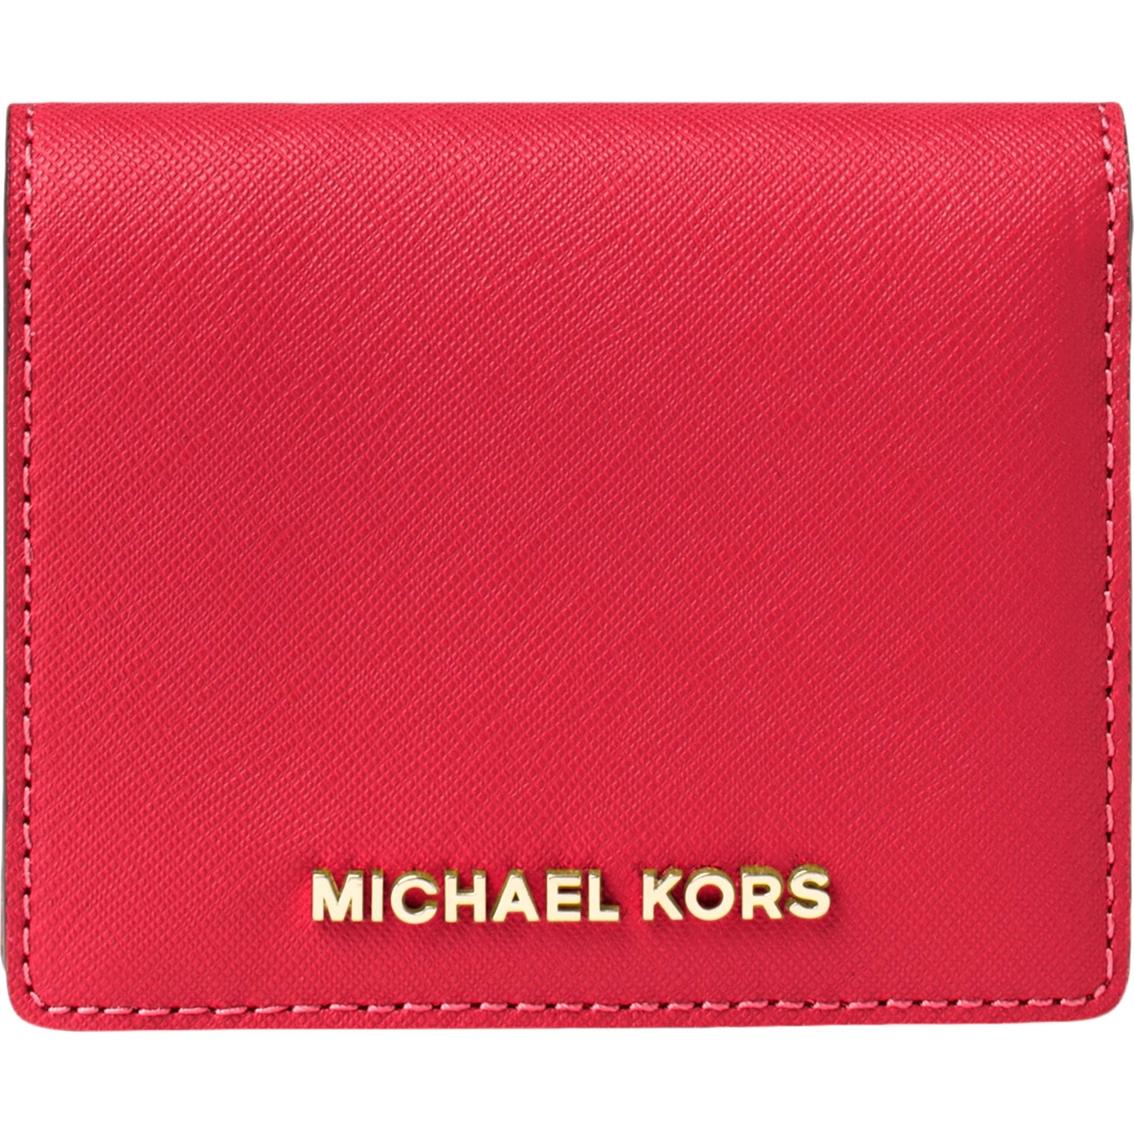 8b05056e832f Michael Kors Jet Set Travel Saffiano Leather Card Holder ...